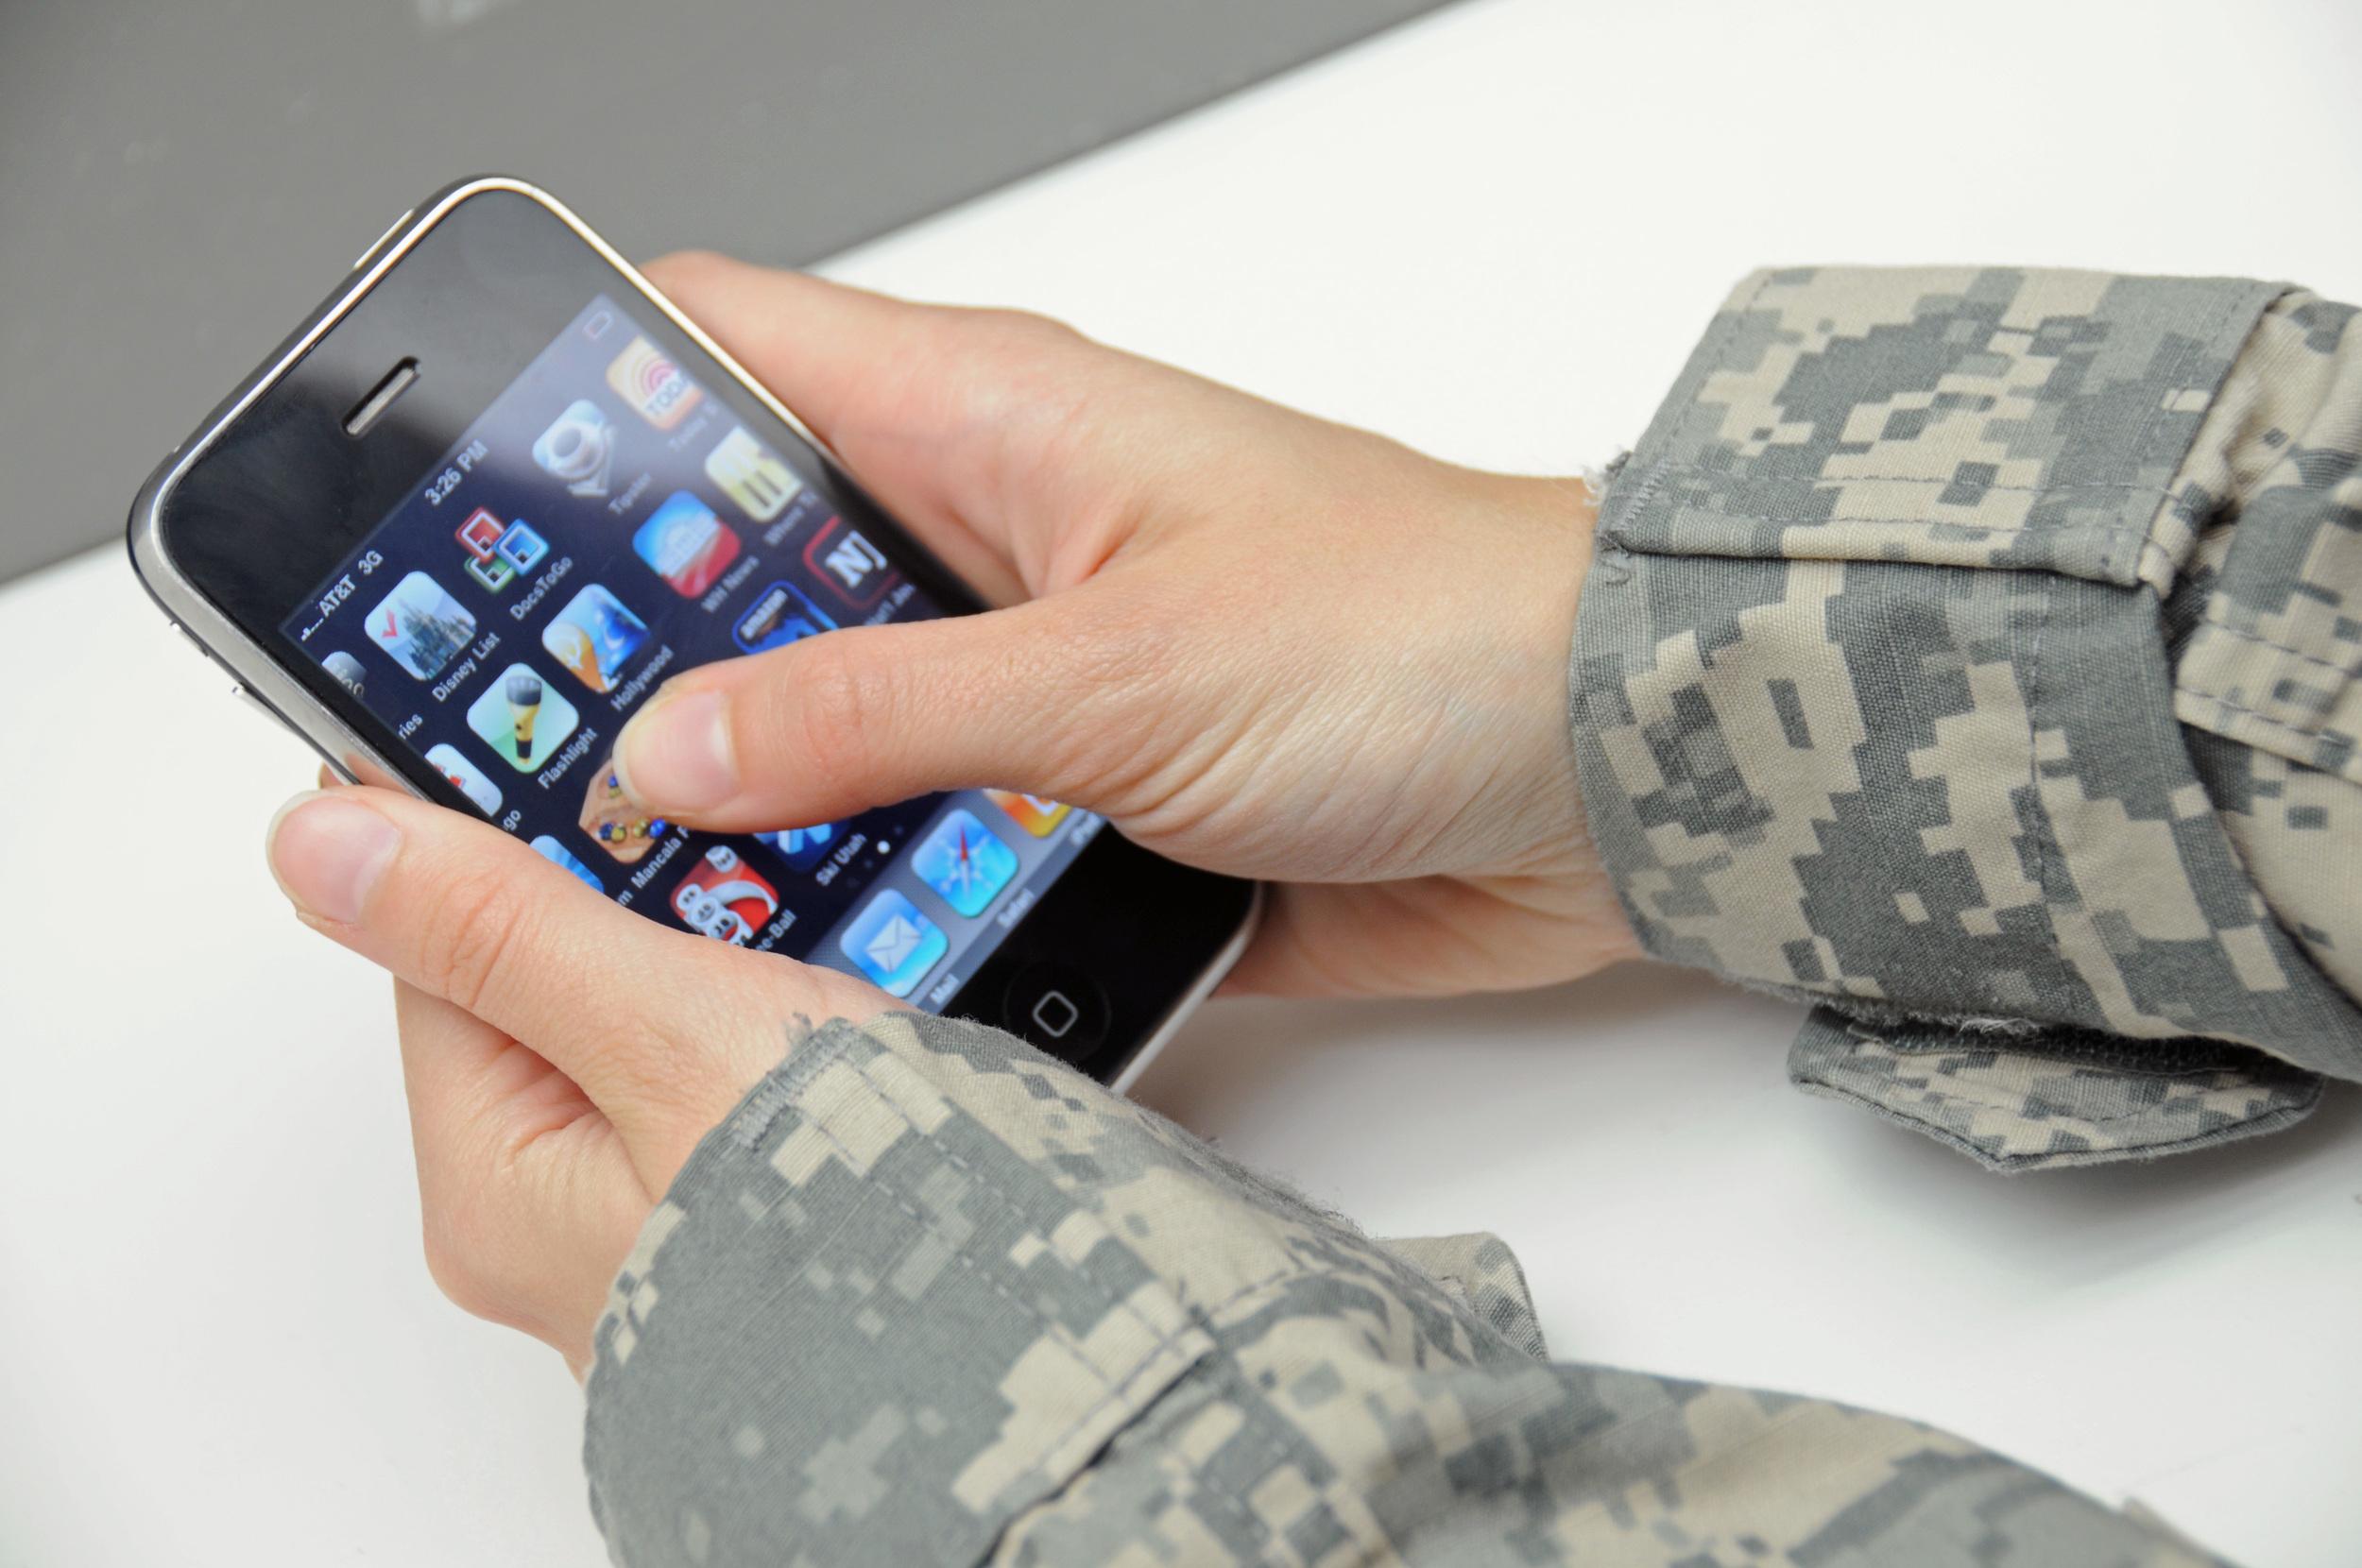 soldier_iPhone.jpg